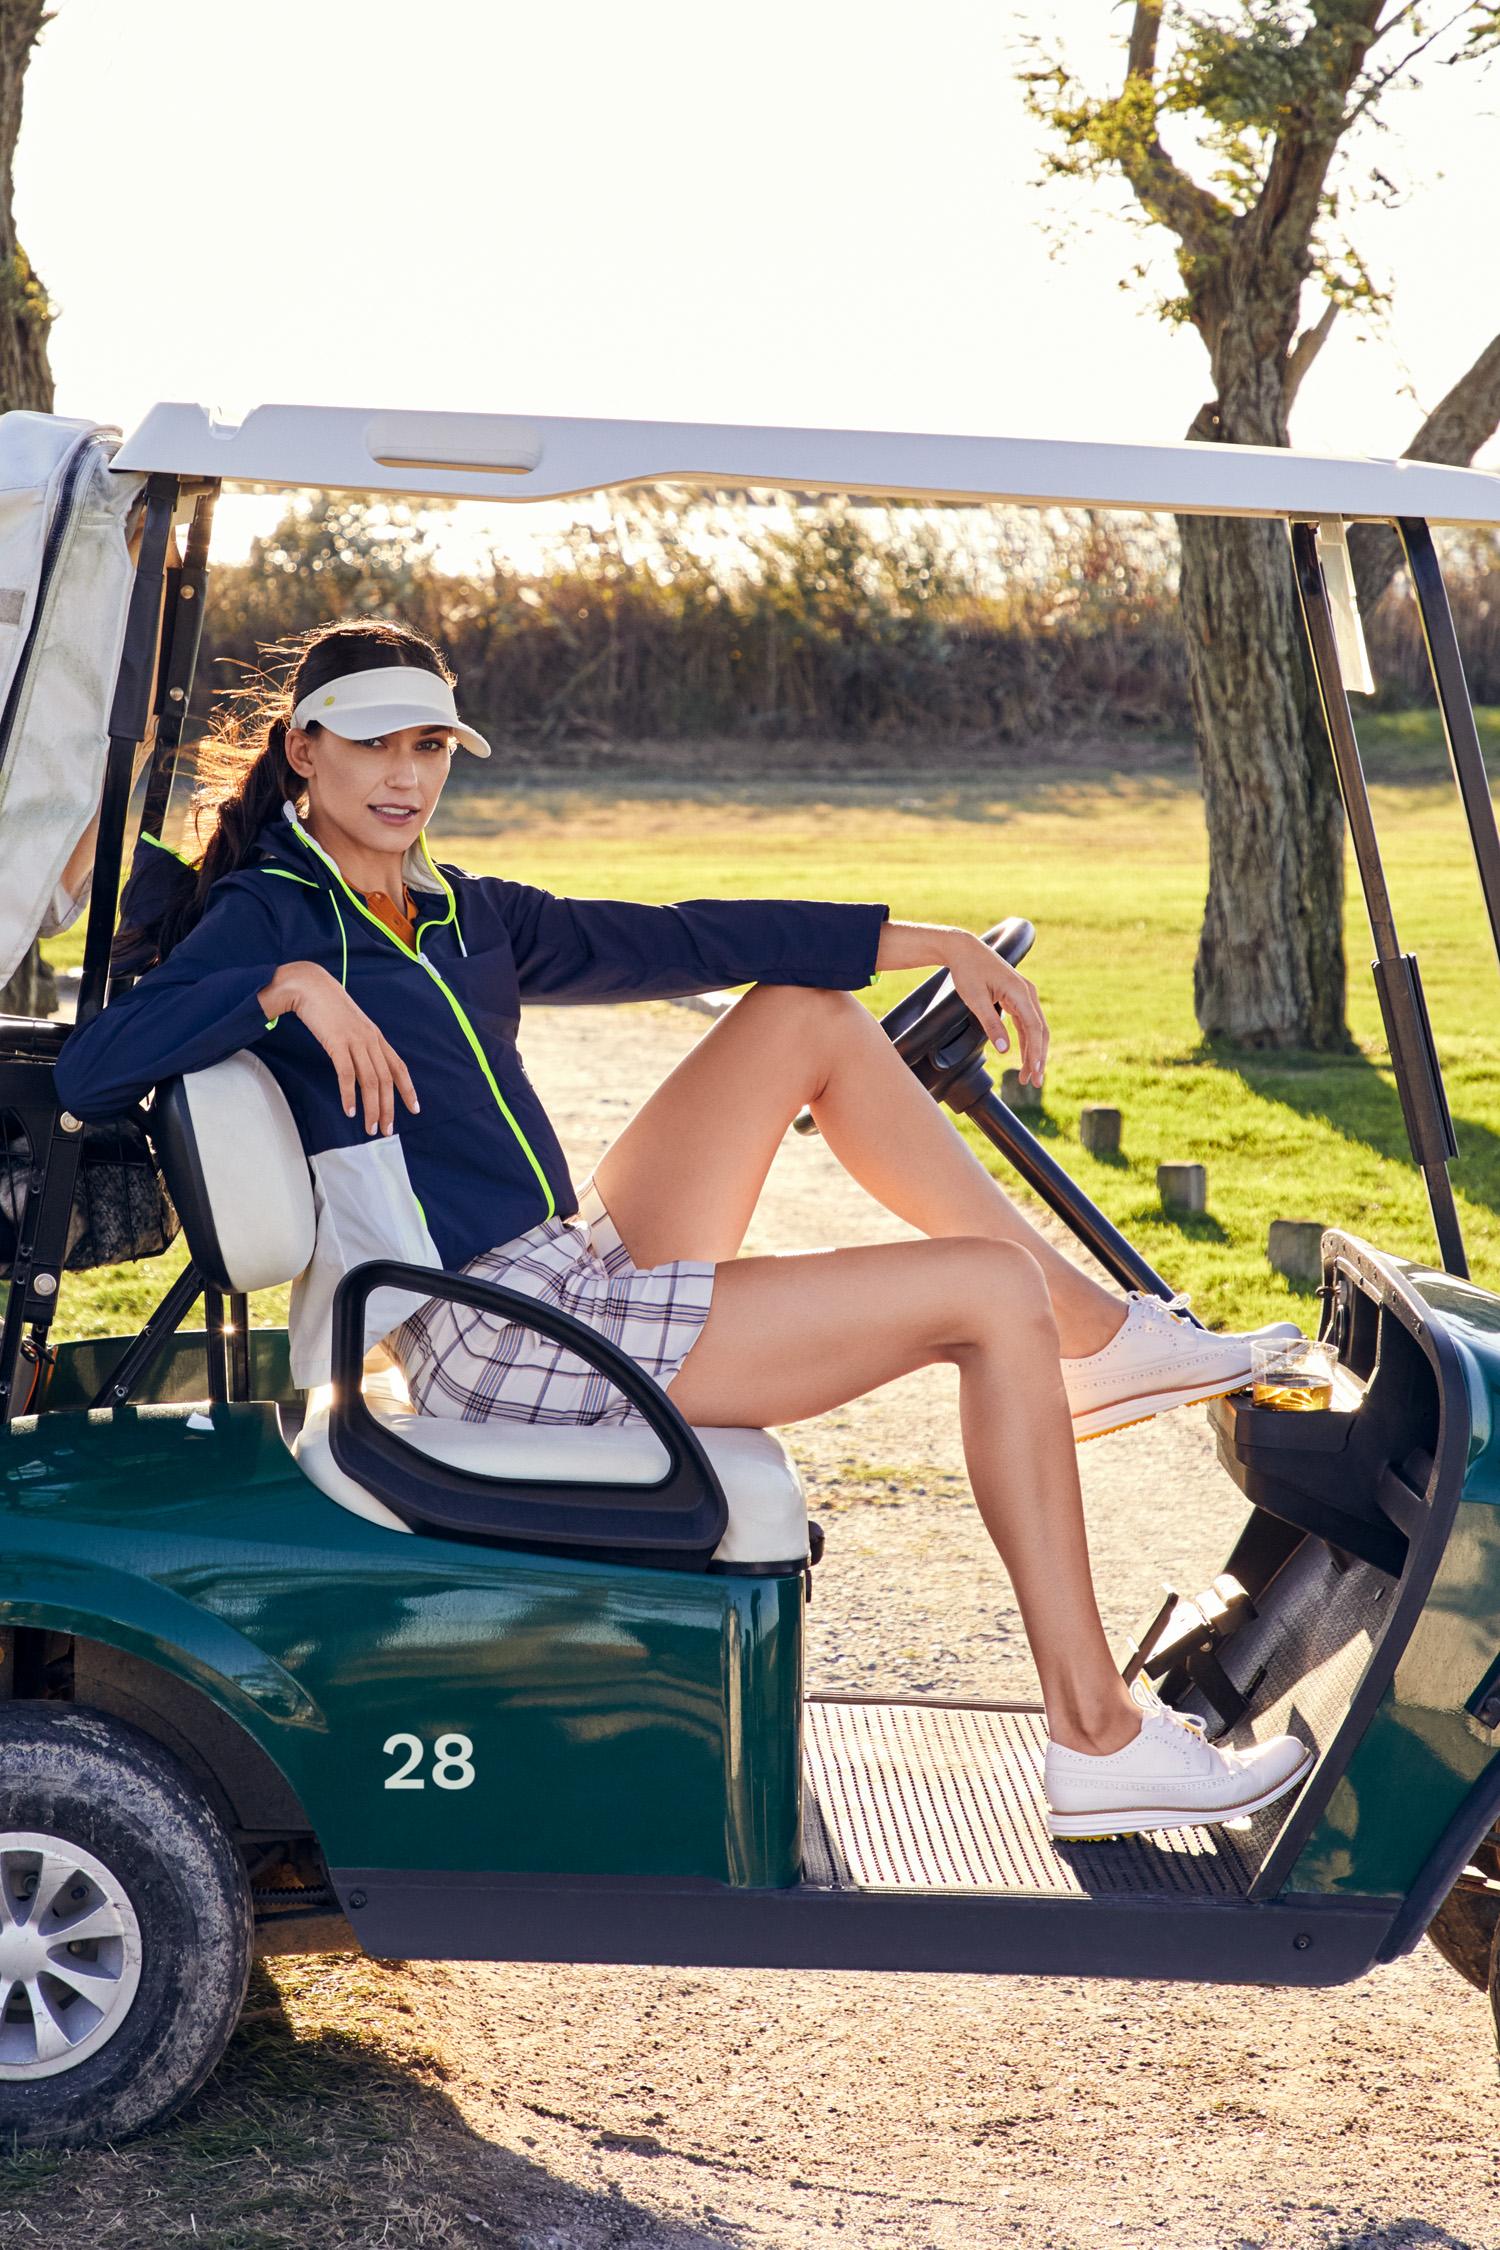 Cole Haan Women's ØriginalGrand Golf Shoes